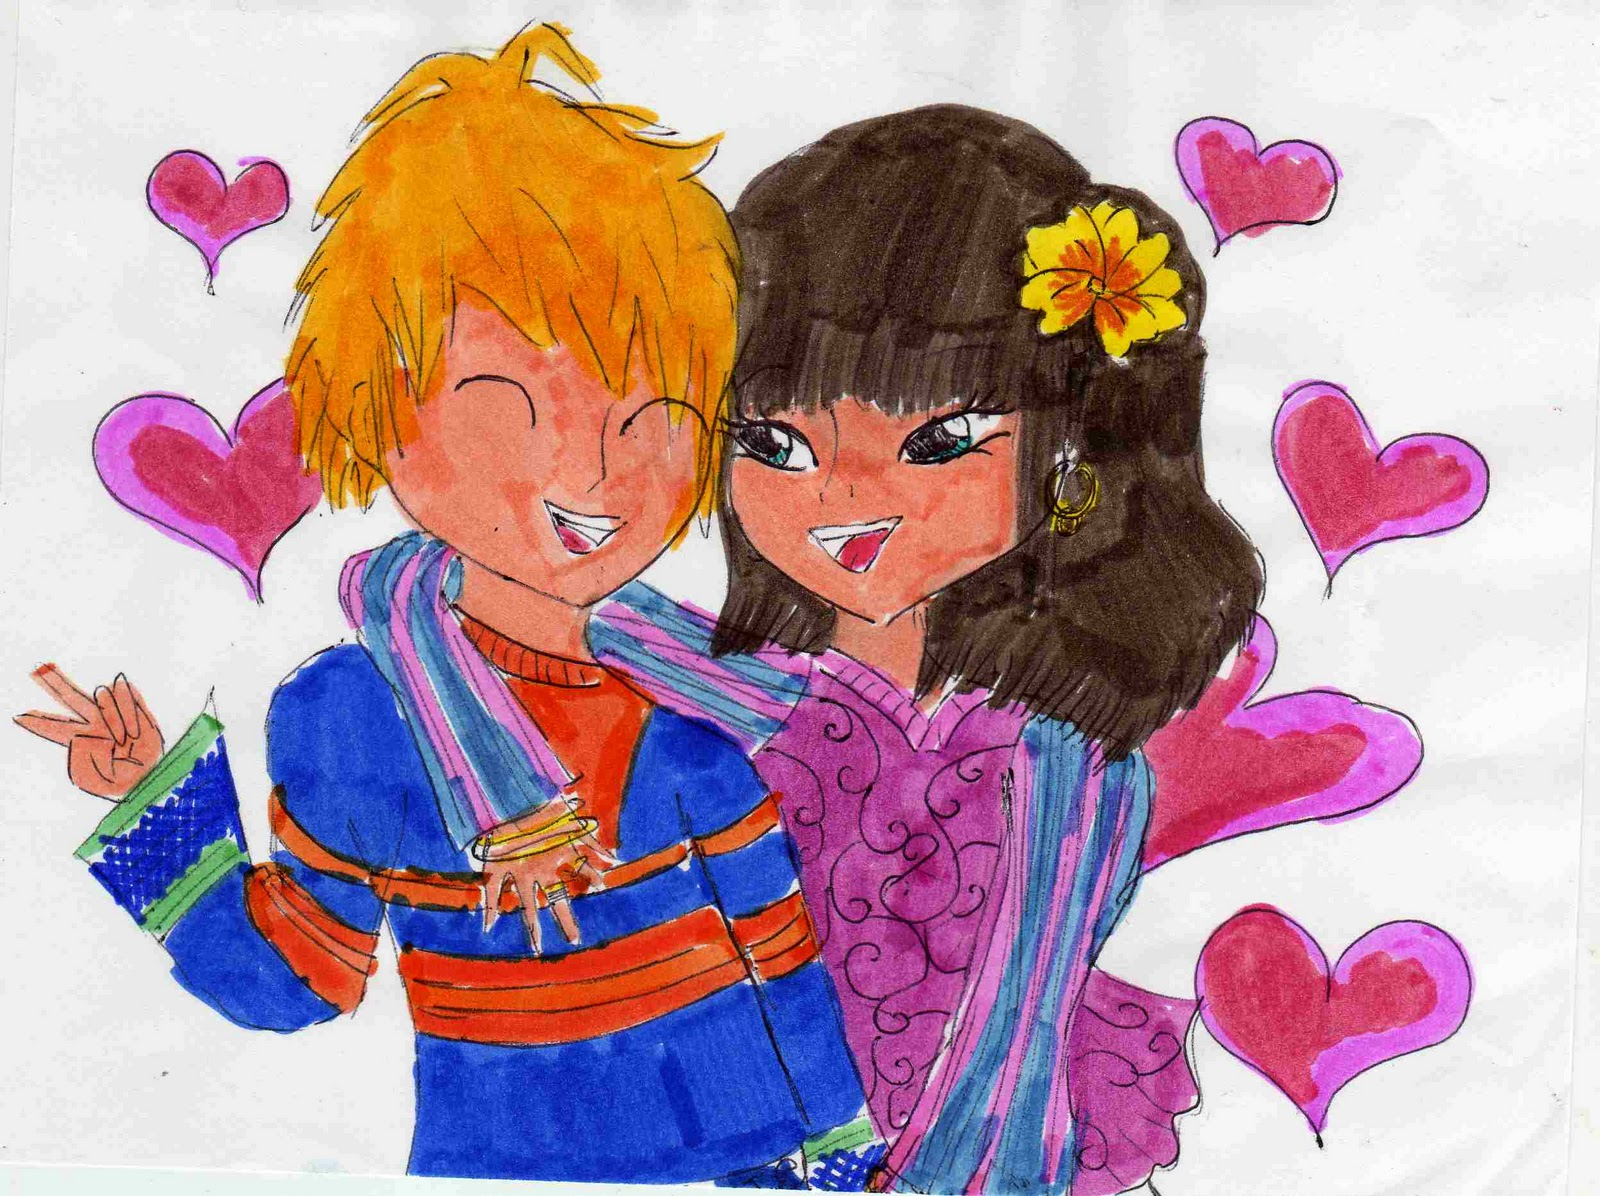 Les dessins de marianne novembre 2011 - Dessin de l amour ...